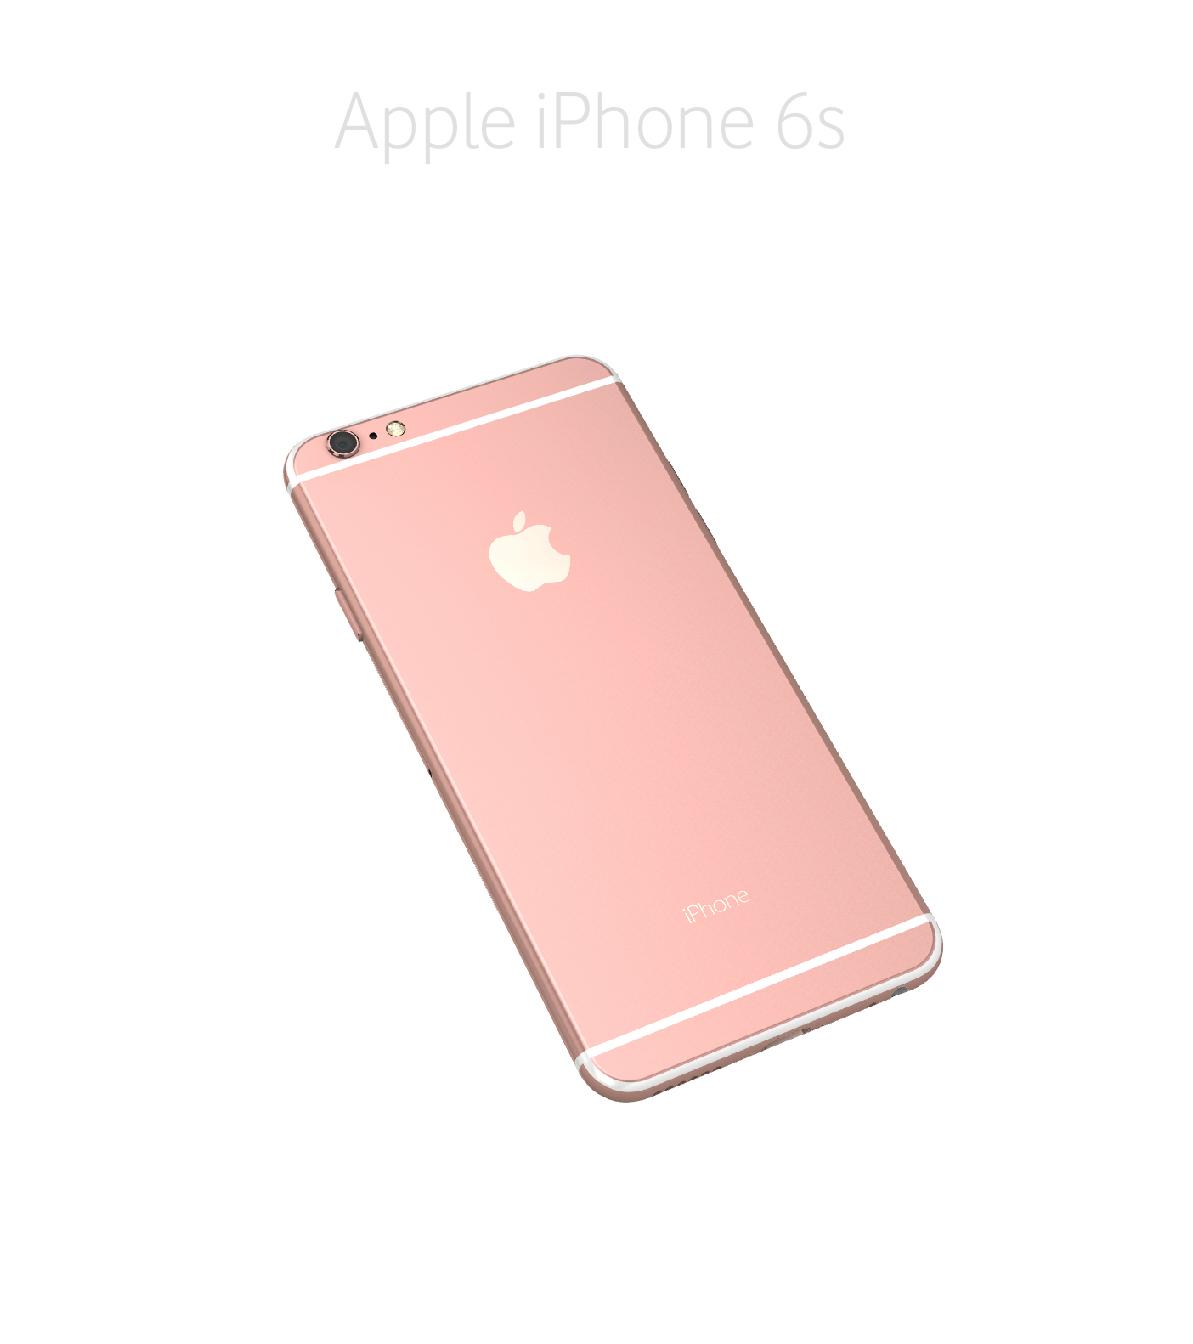 Laga baksida/chassi iPhone 6s